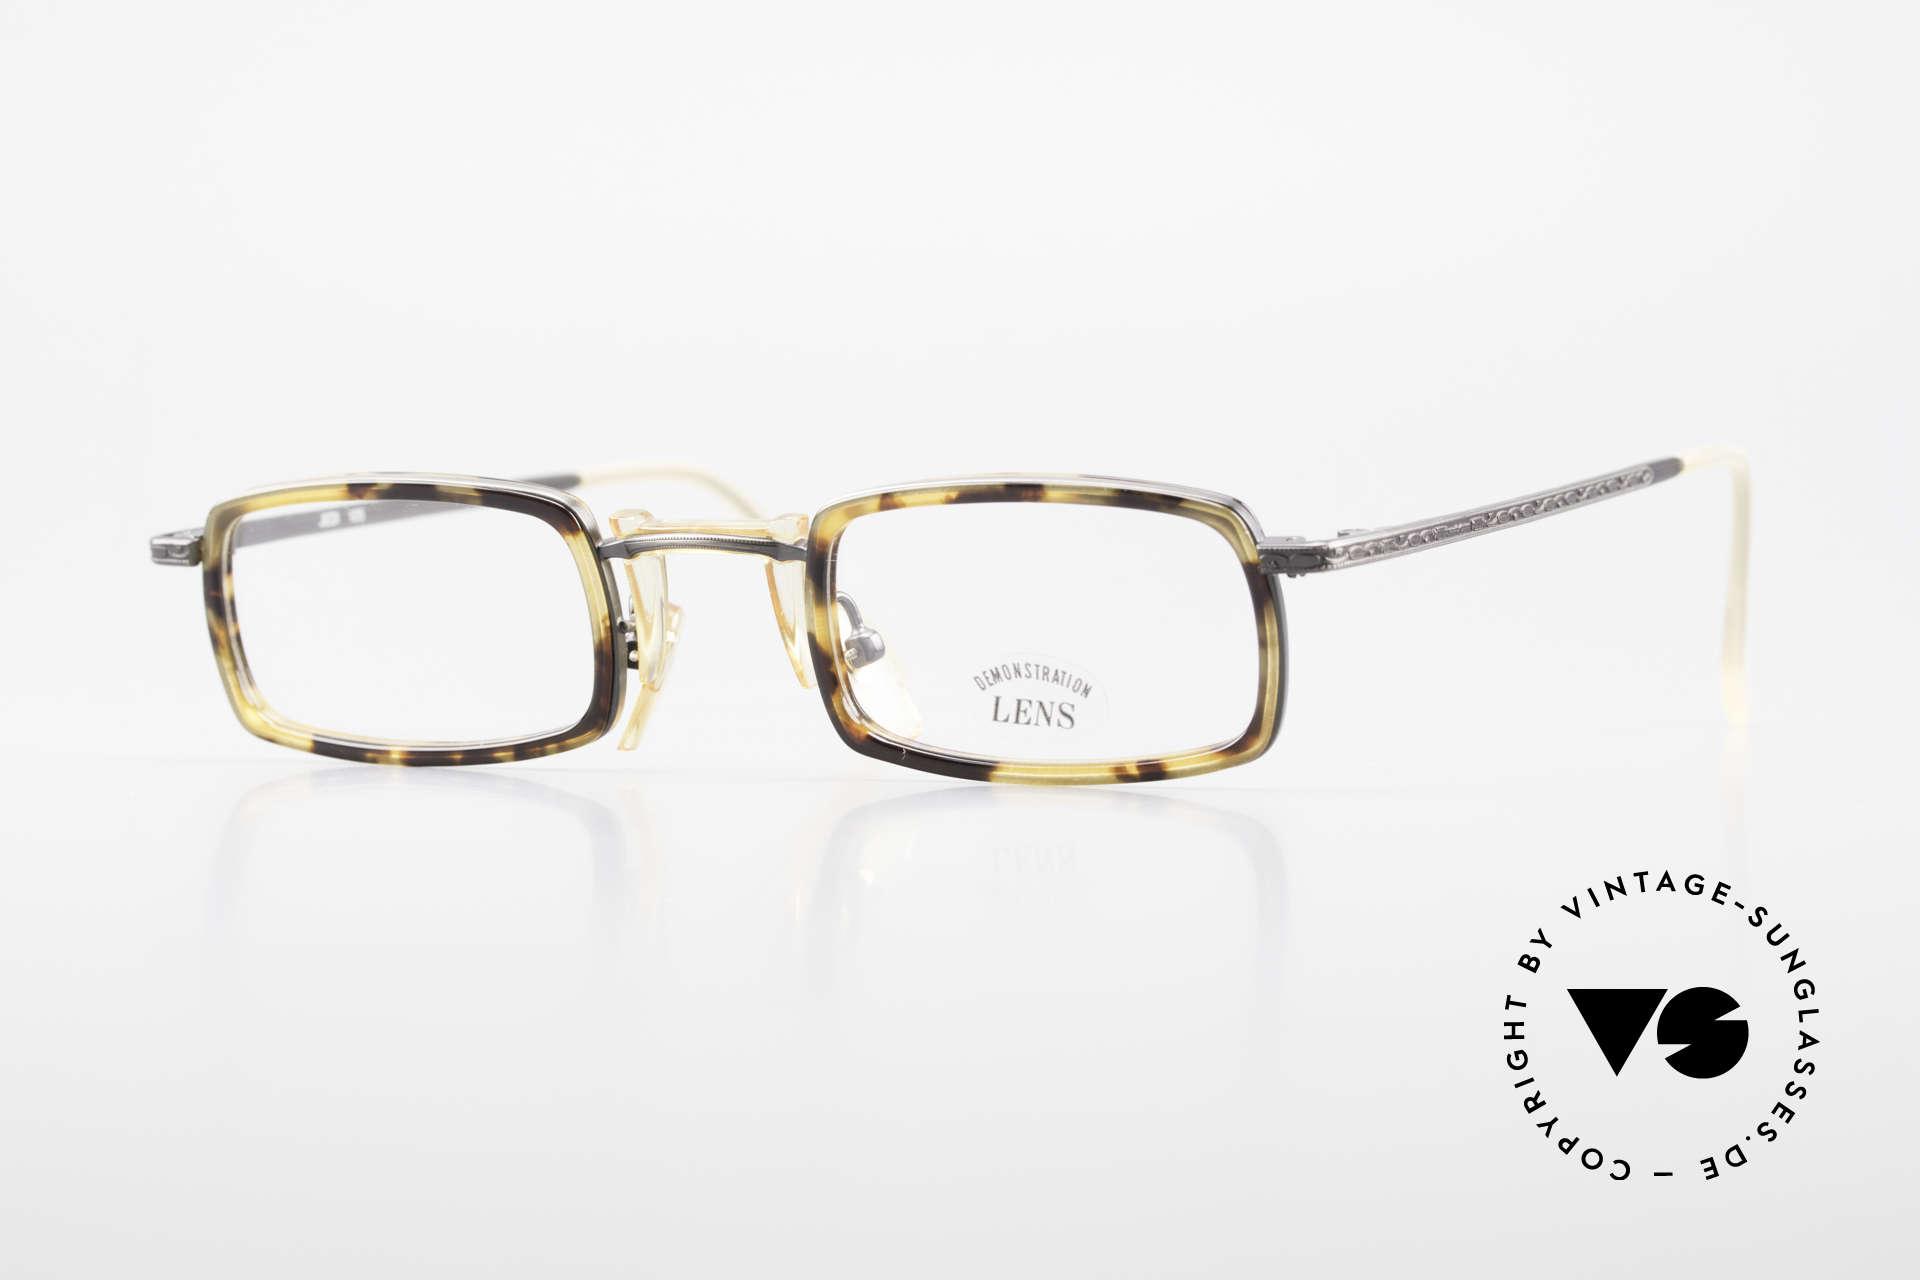 Freudenhaus Jedi Square 90's Designer Frame, vintage designer glasses by FREUDENHAUS, Munich, Made for Men and Women